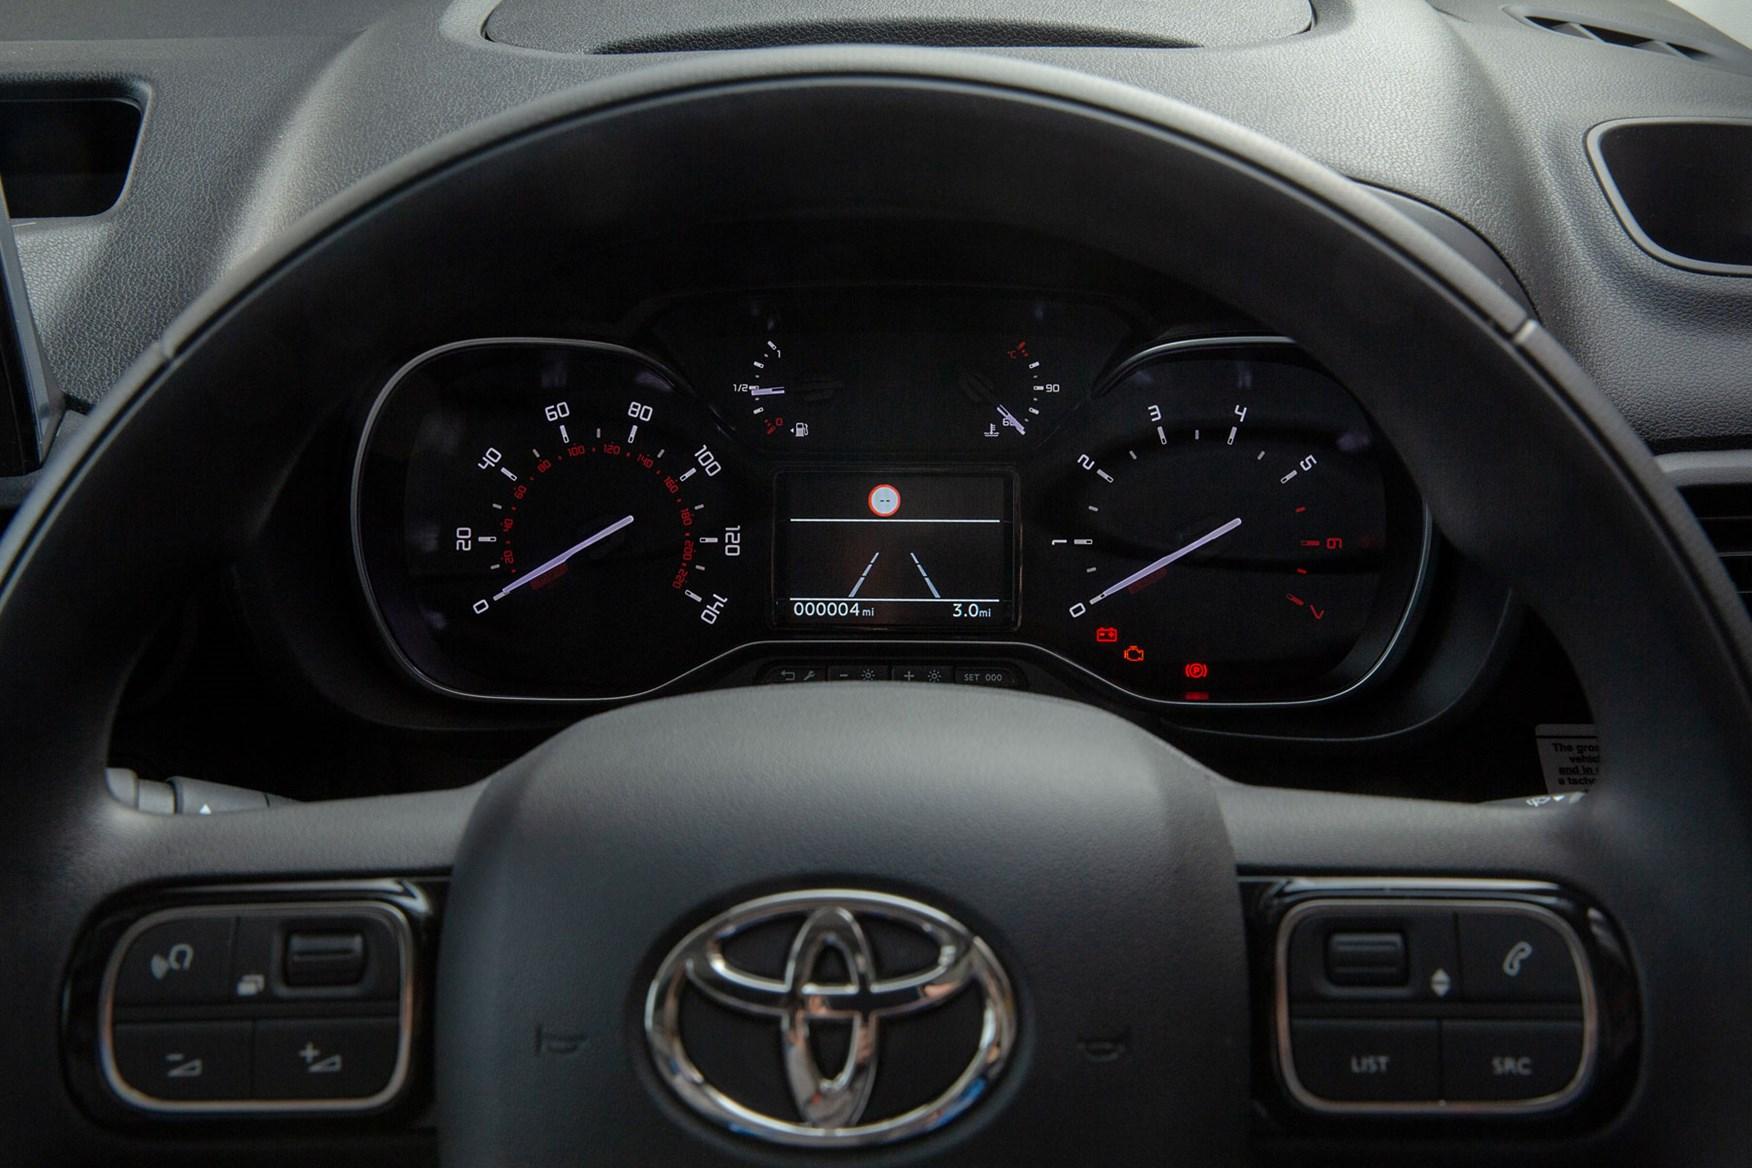 2020 Toyota Proace City review - cab interior, gauges